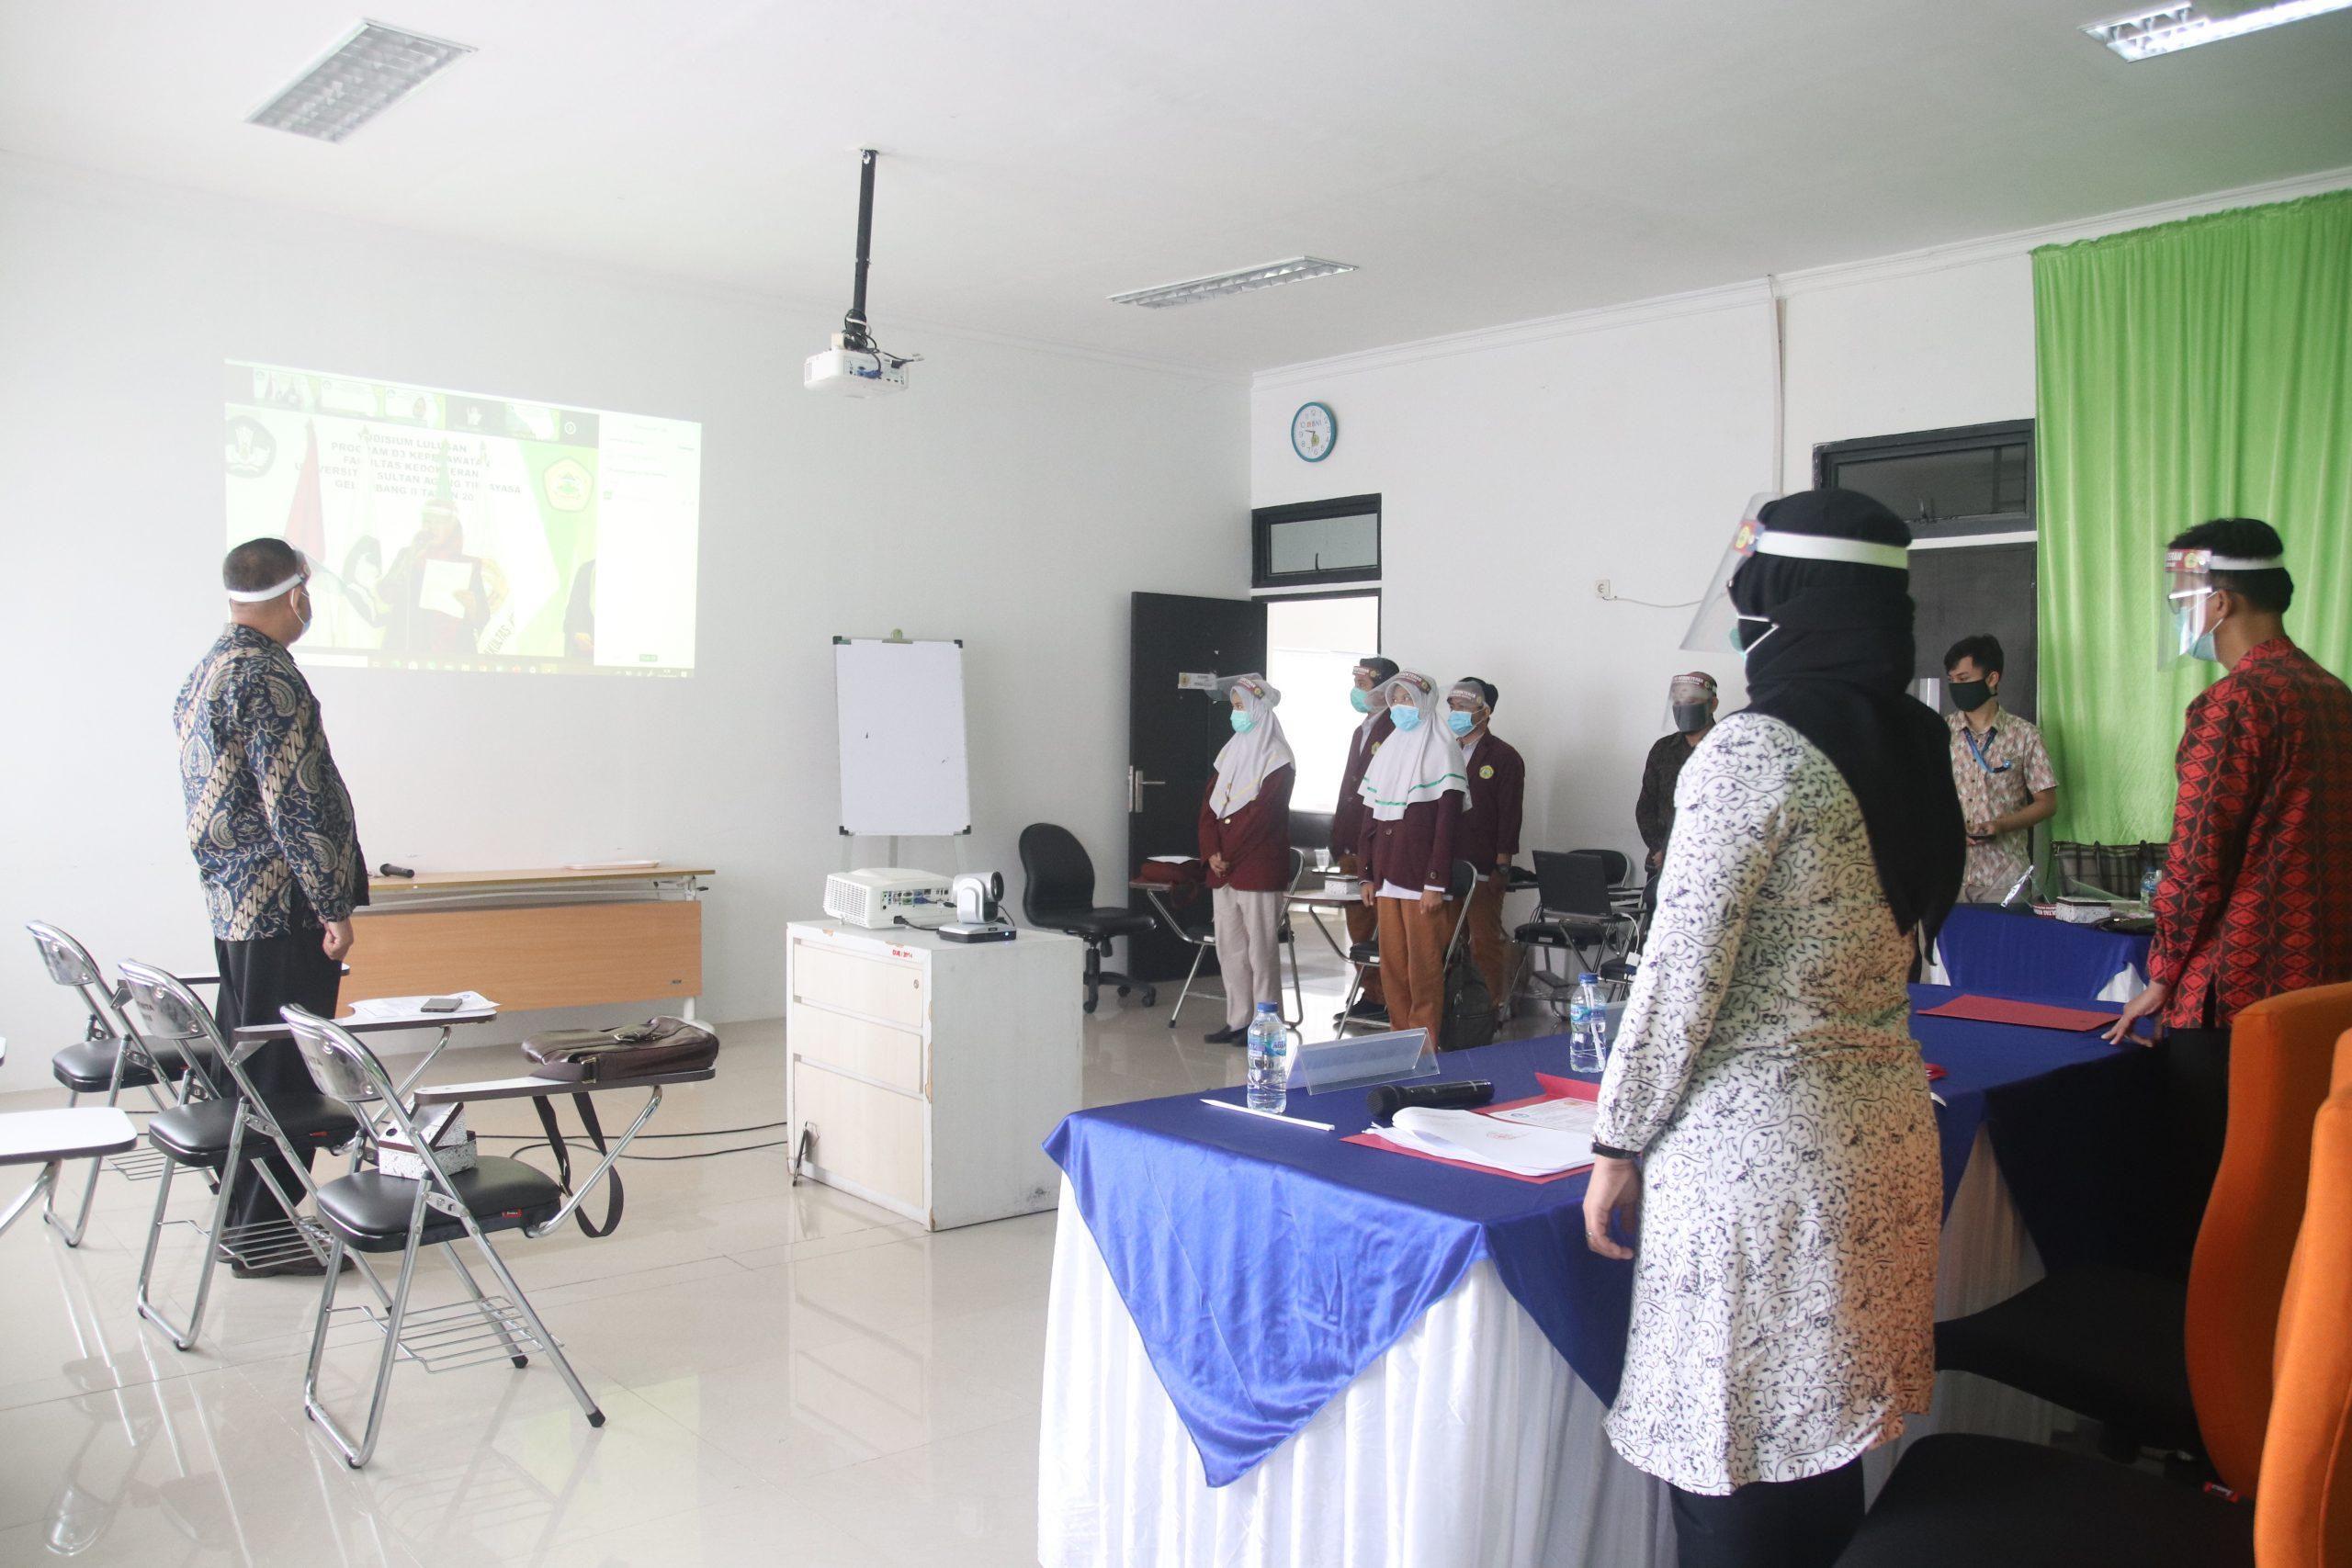 Resmi Tamatkan Pendidikan, 117 Lulusan D3 Keperawatan Fakultas Kedokteran Untirta Diharapkan Siap Jadi Leader